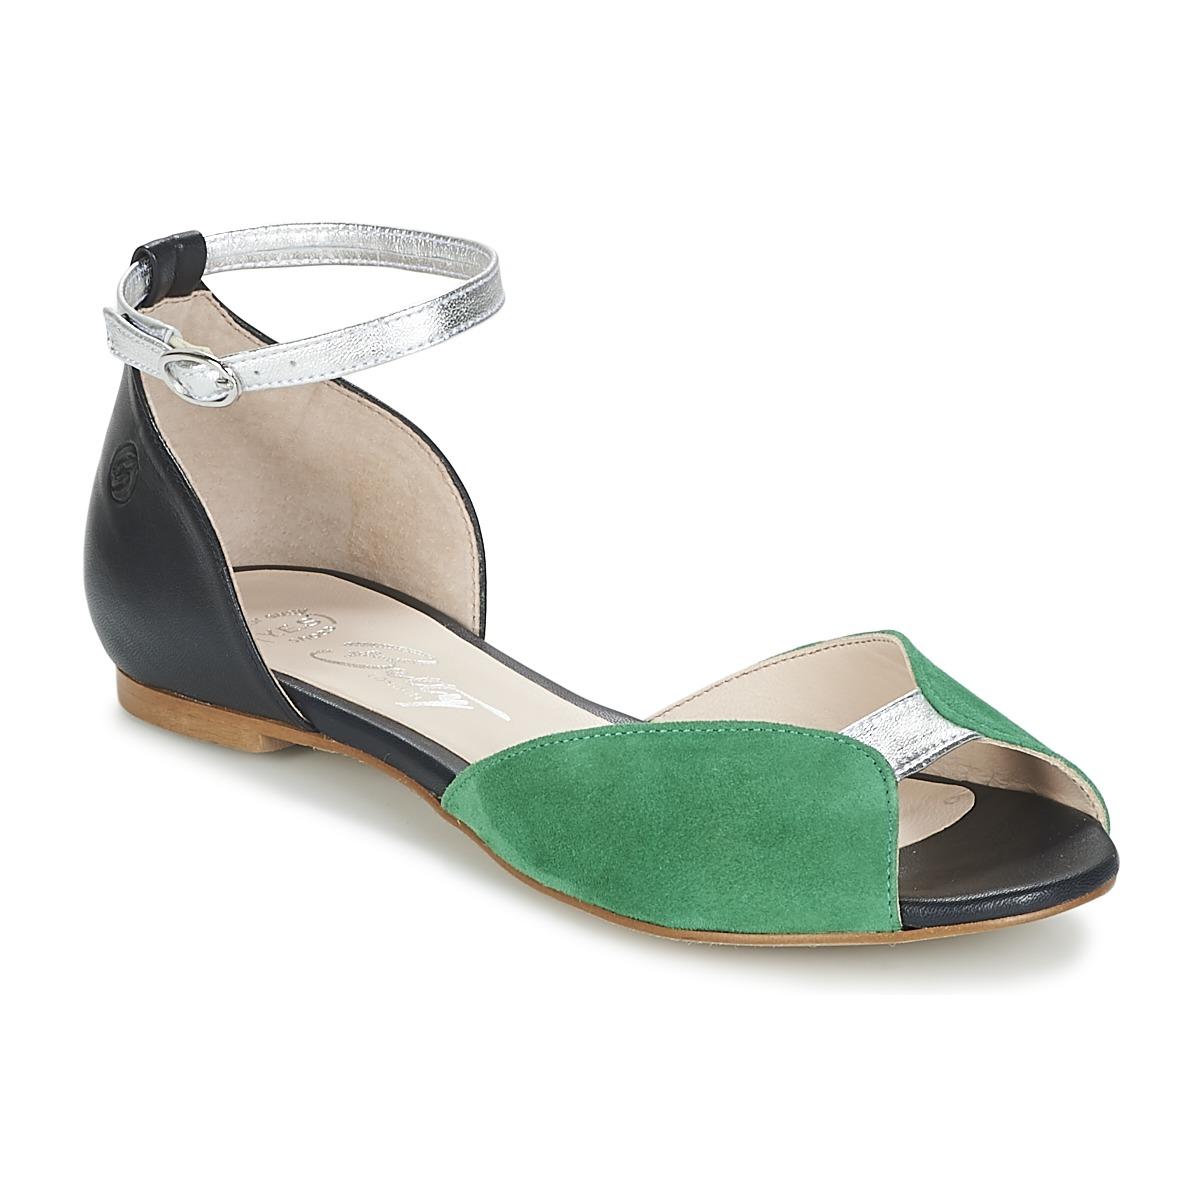 Betty London INALI Schwarz / Silbern / Grün - Kostenloser Versand bei Spartoode ! - Schuhe Sandalen / Sandaletten Damen 55,99 €